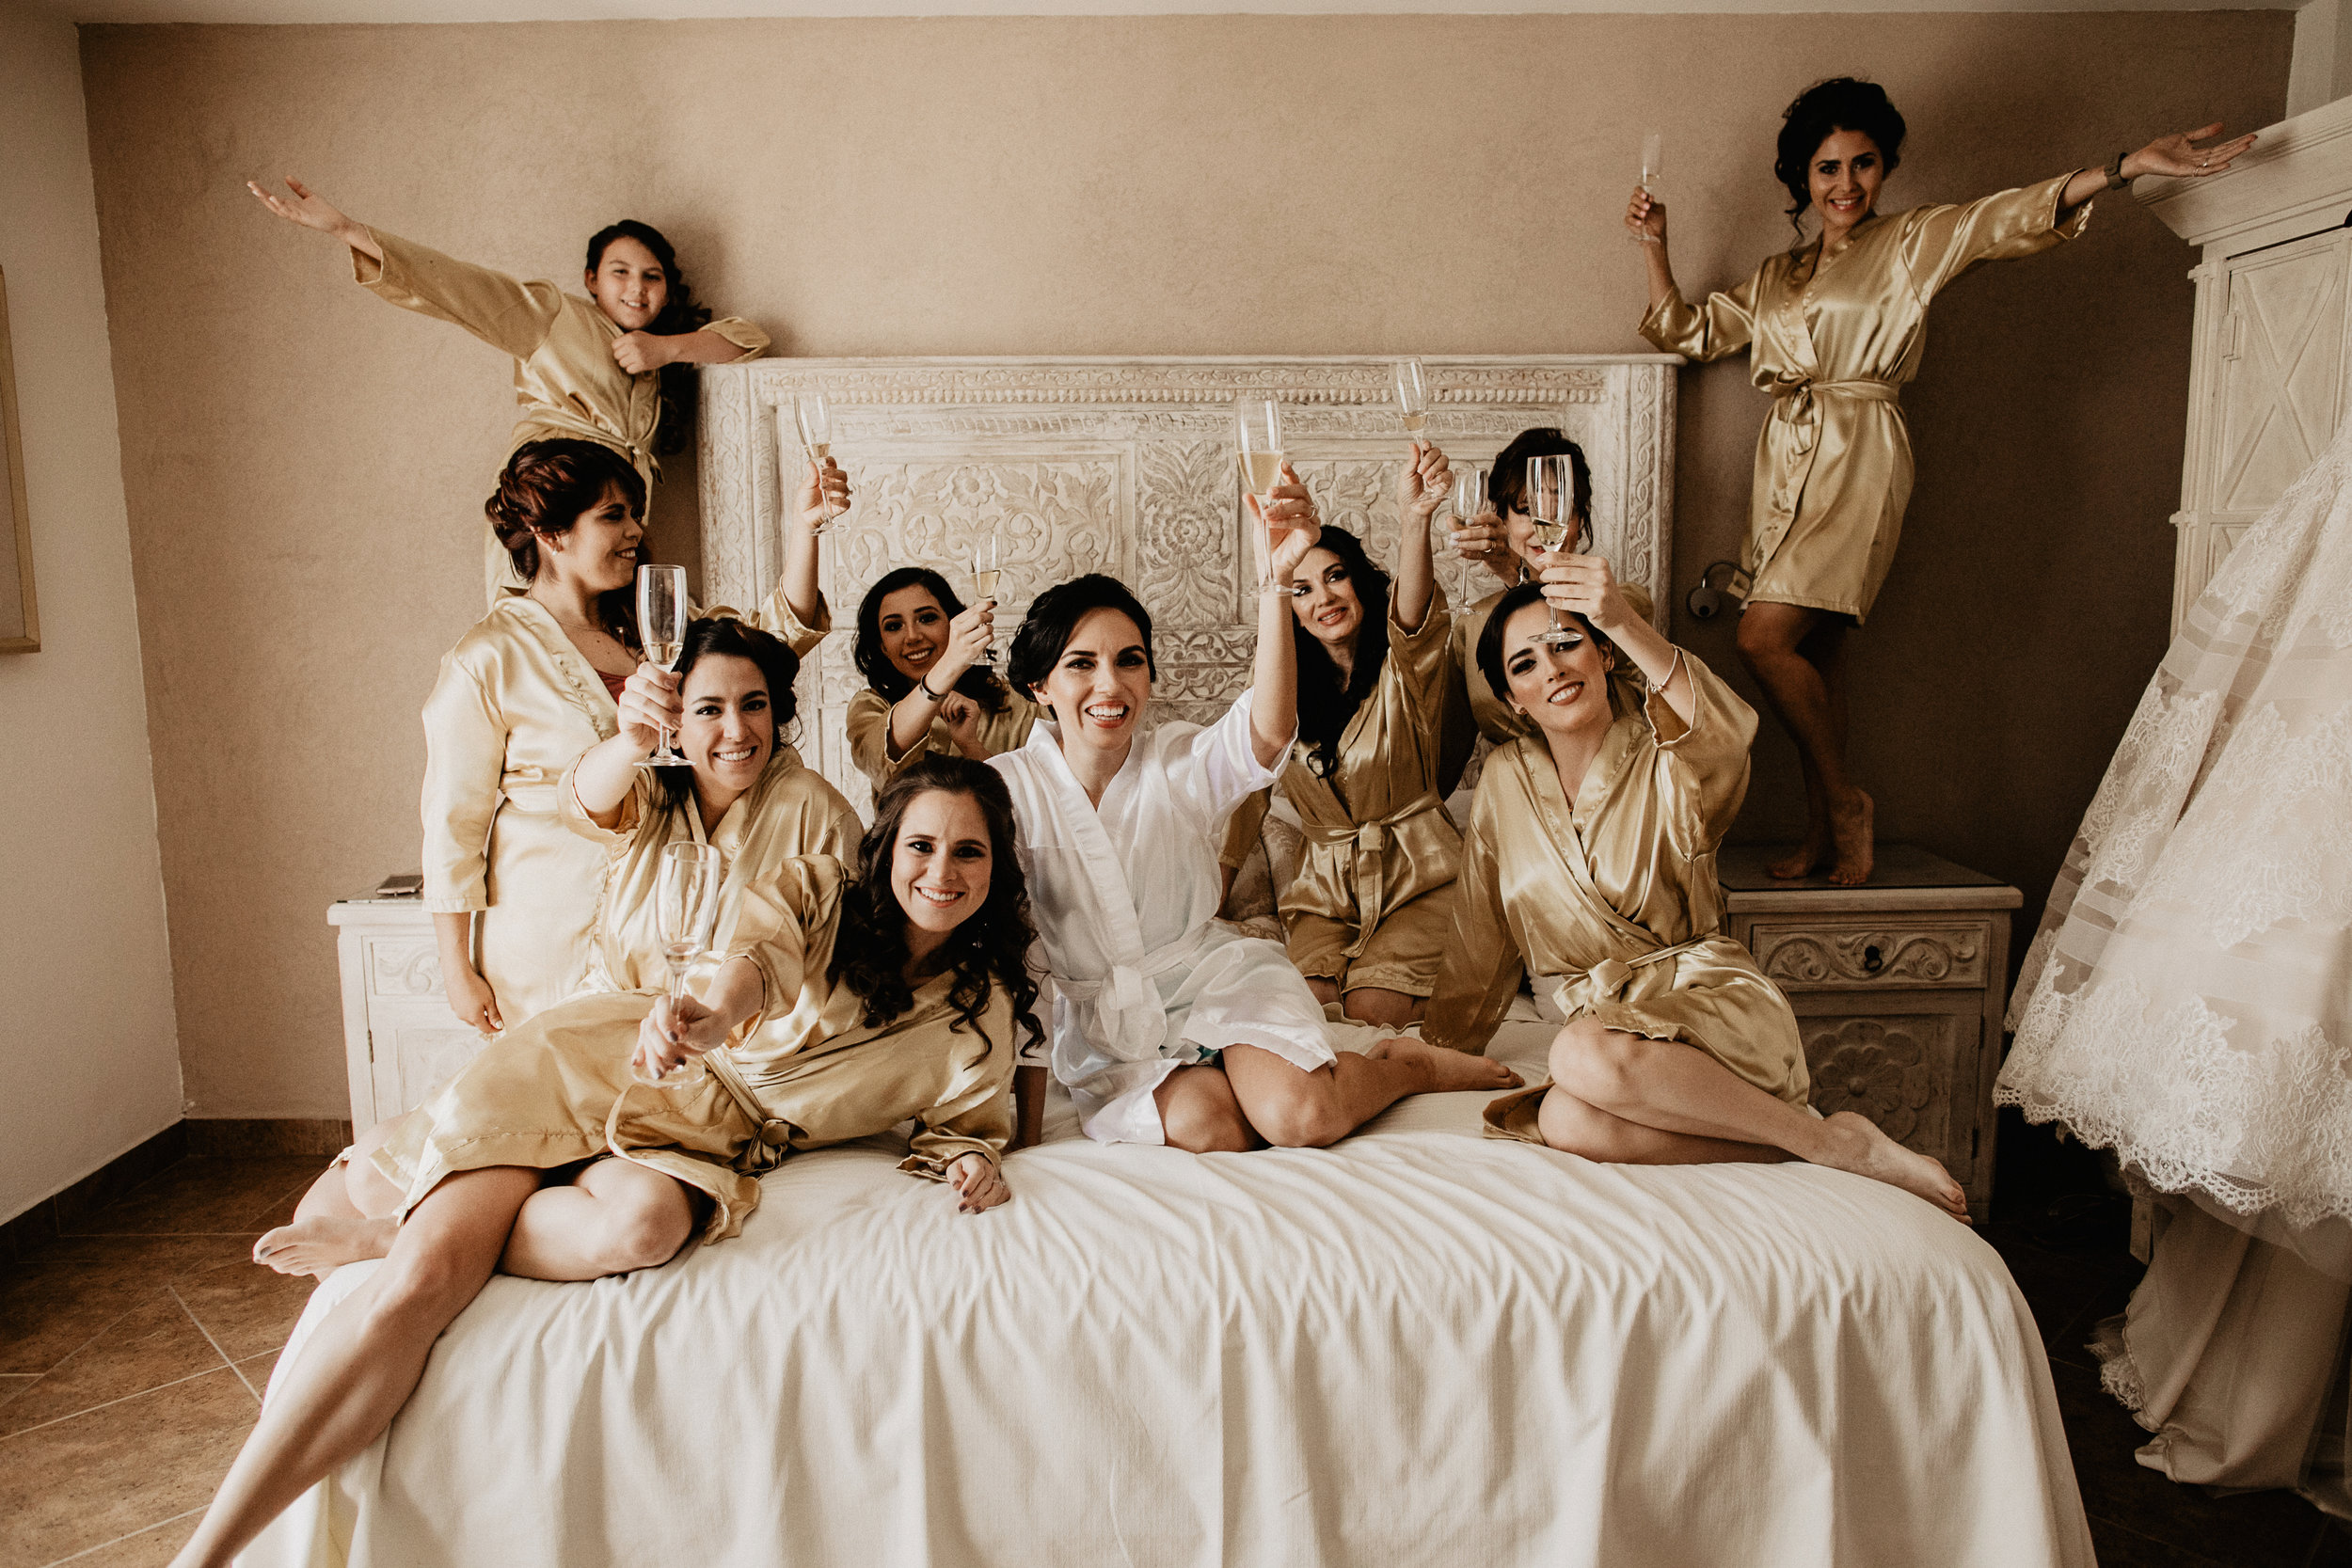 Alfonso_flores_destination_wedding_photography_vanesa_carlos-113.JPG